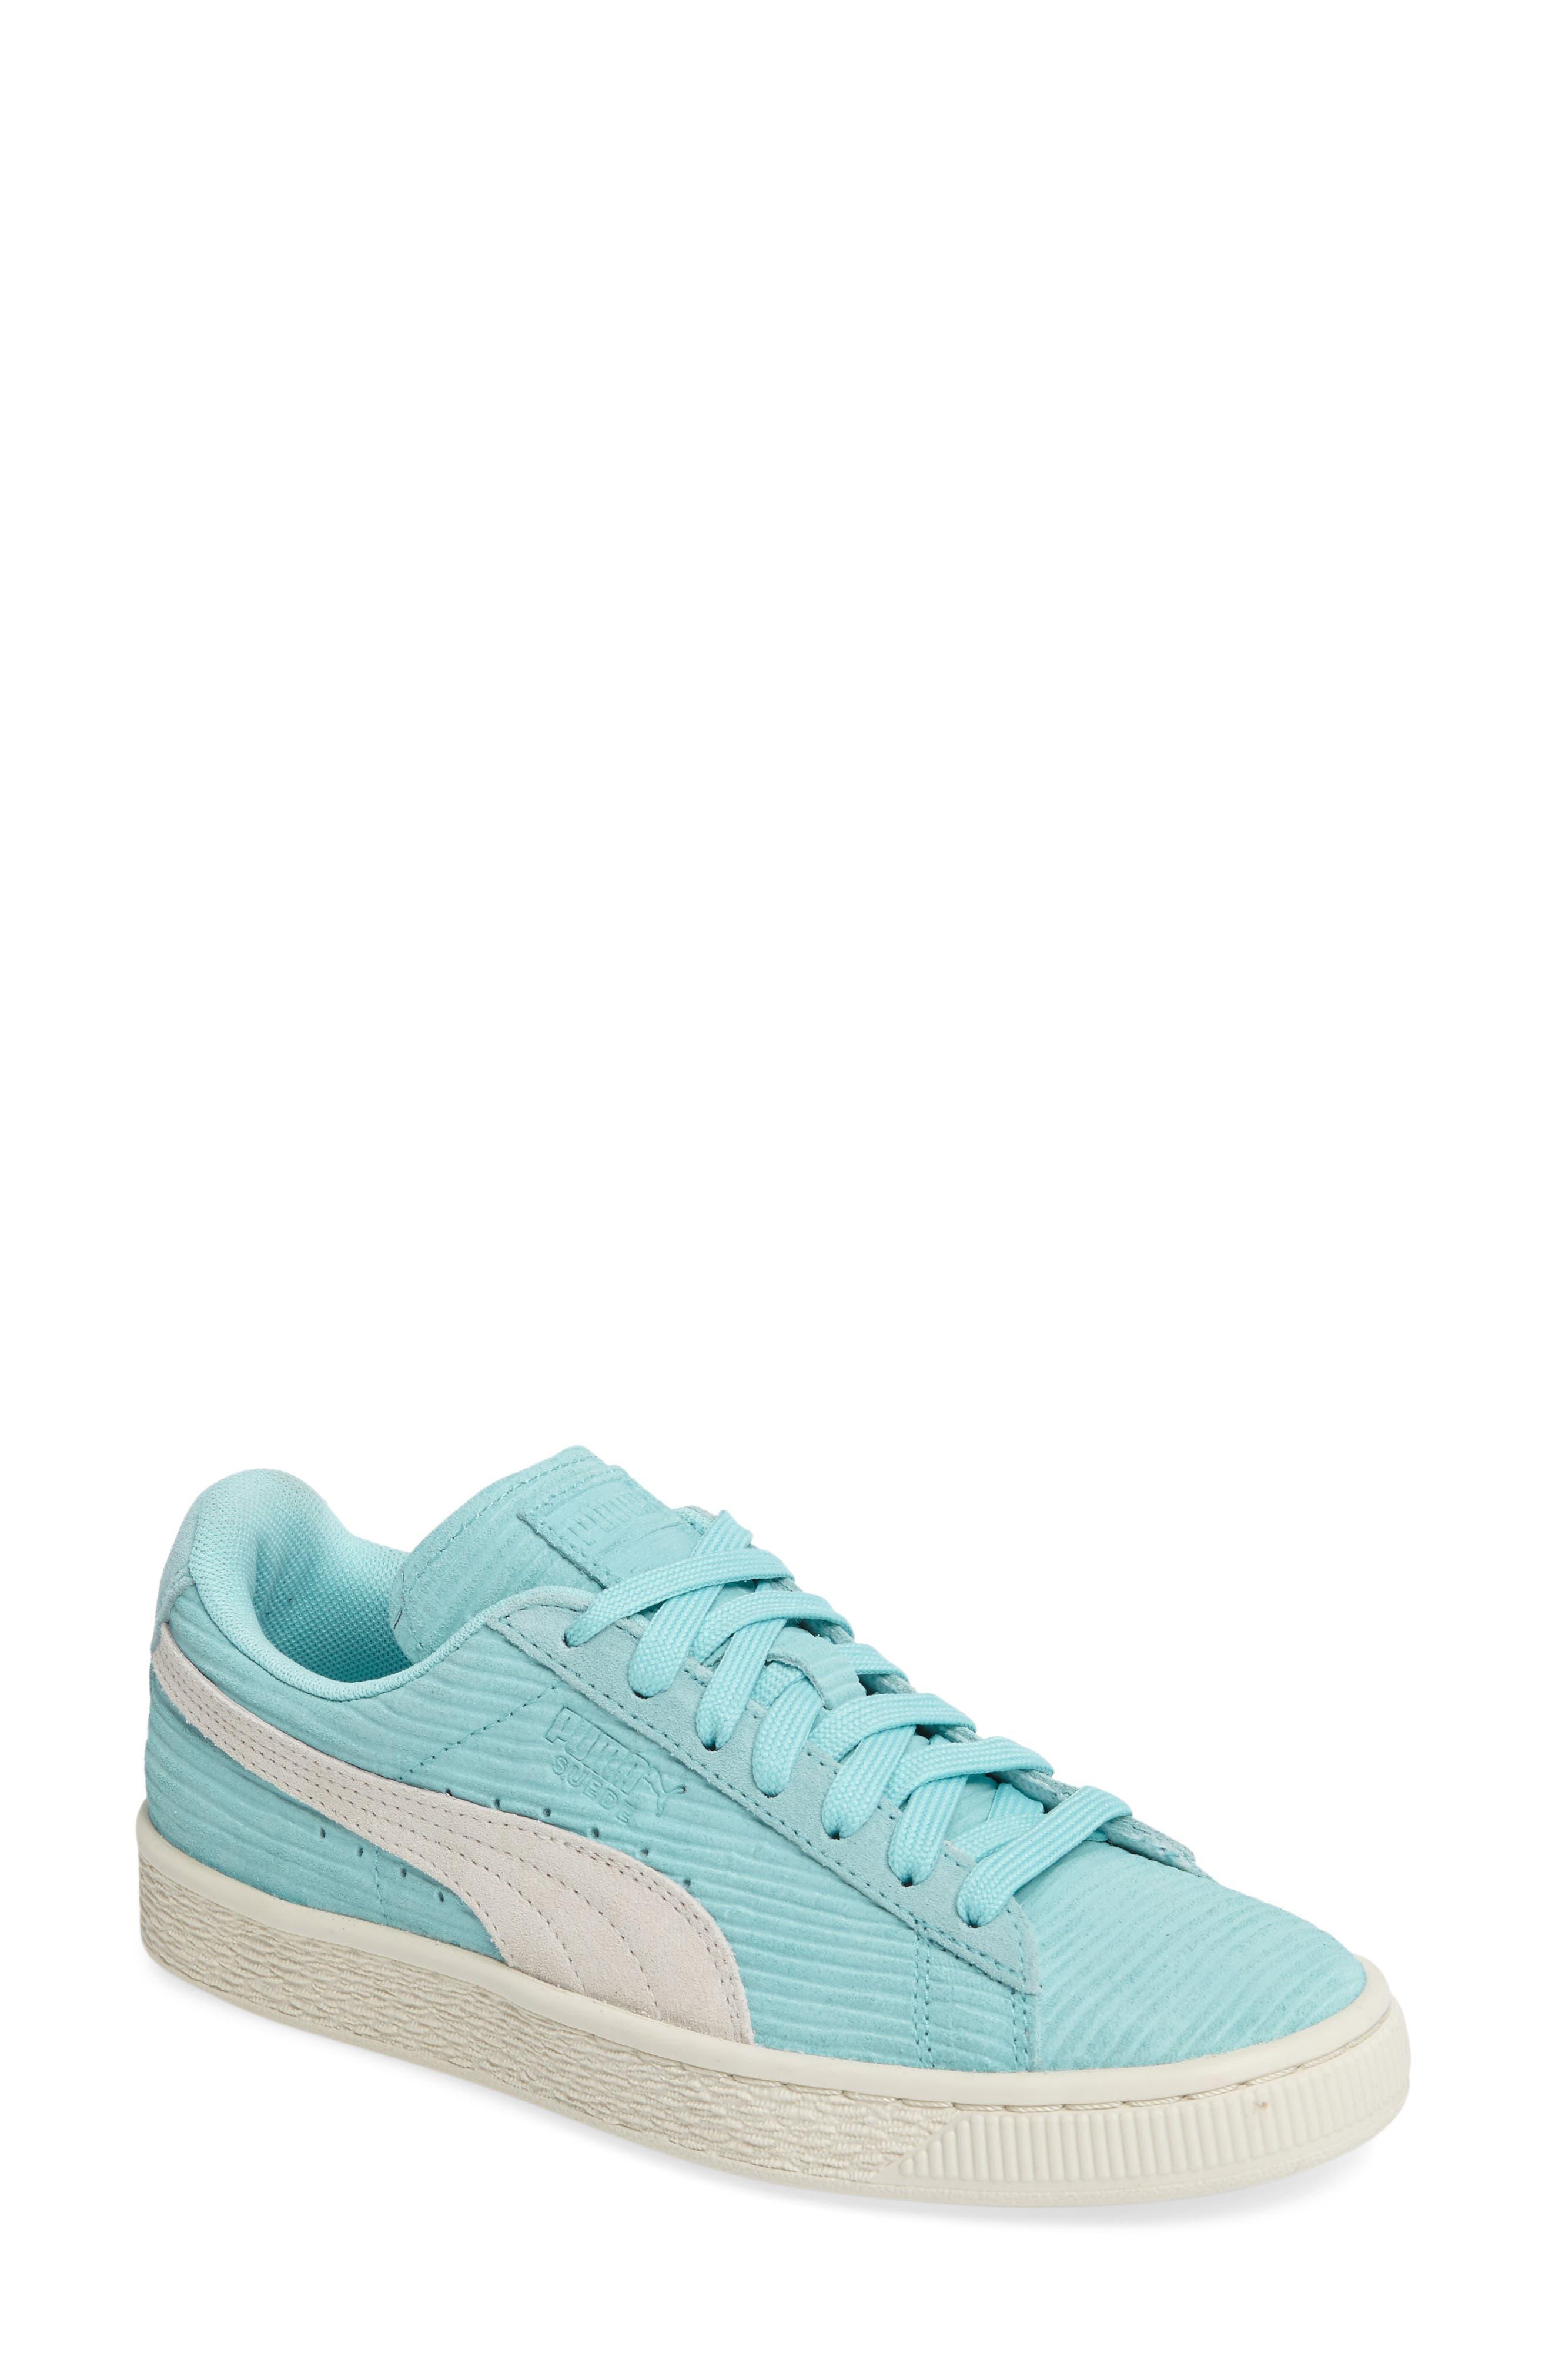 Main Image - PUMA Suede Classic Embossed Sneaker (Women)